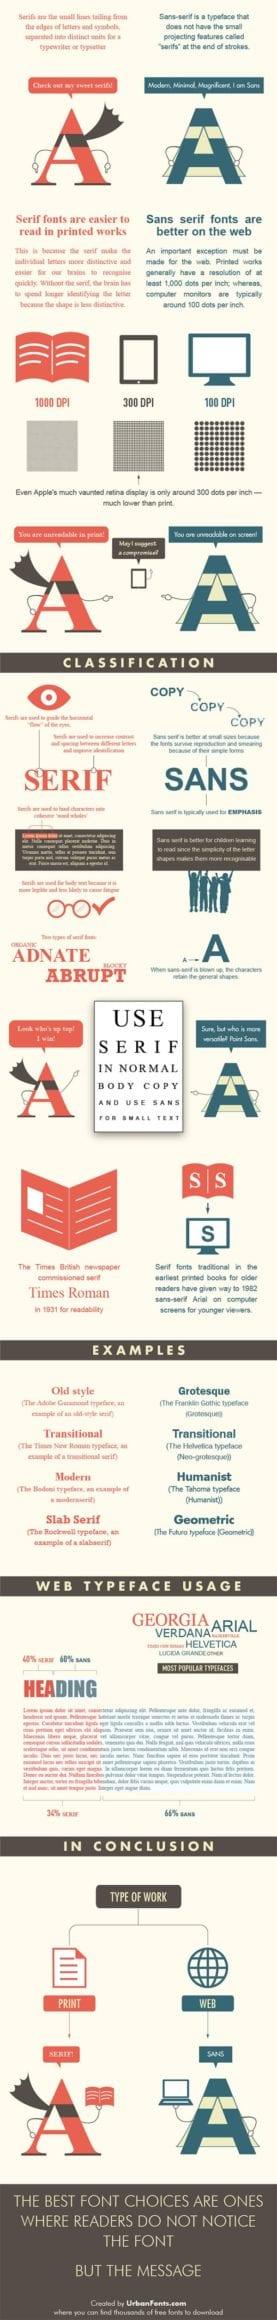 erif-vs-sans-serif-1